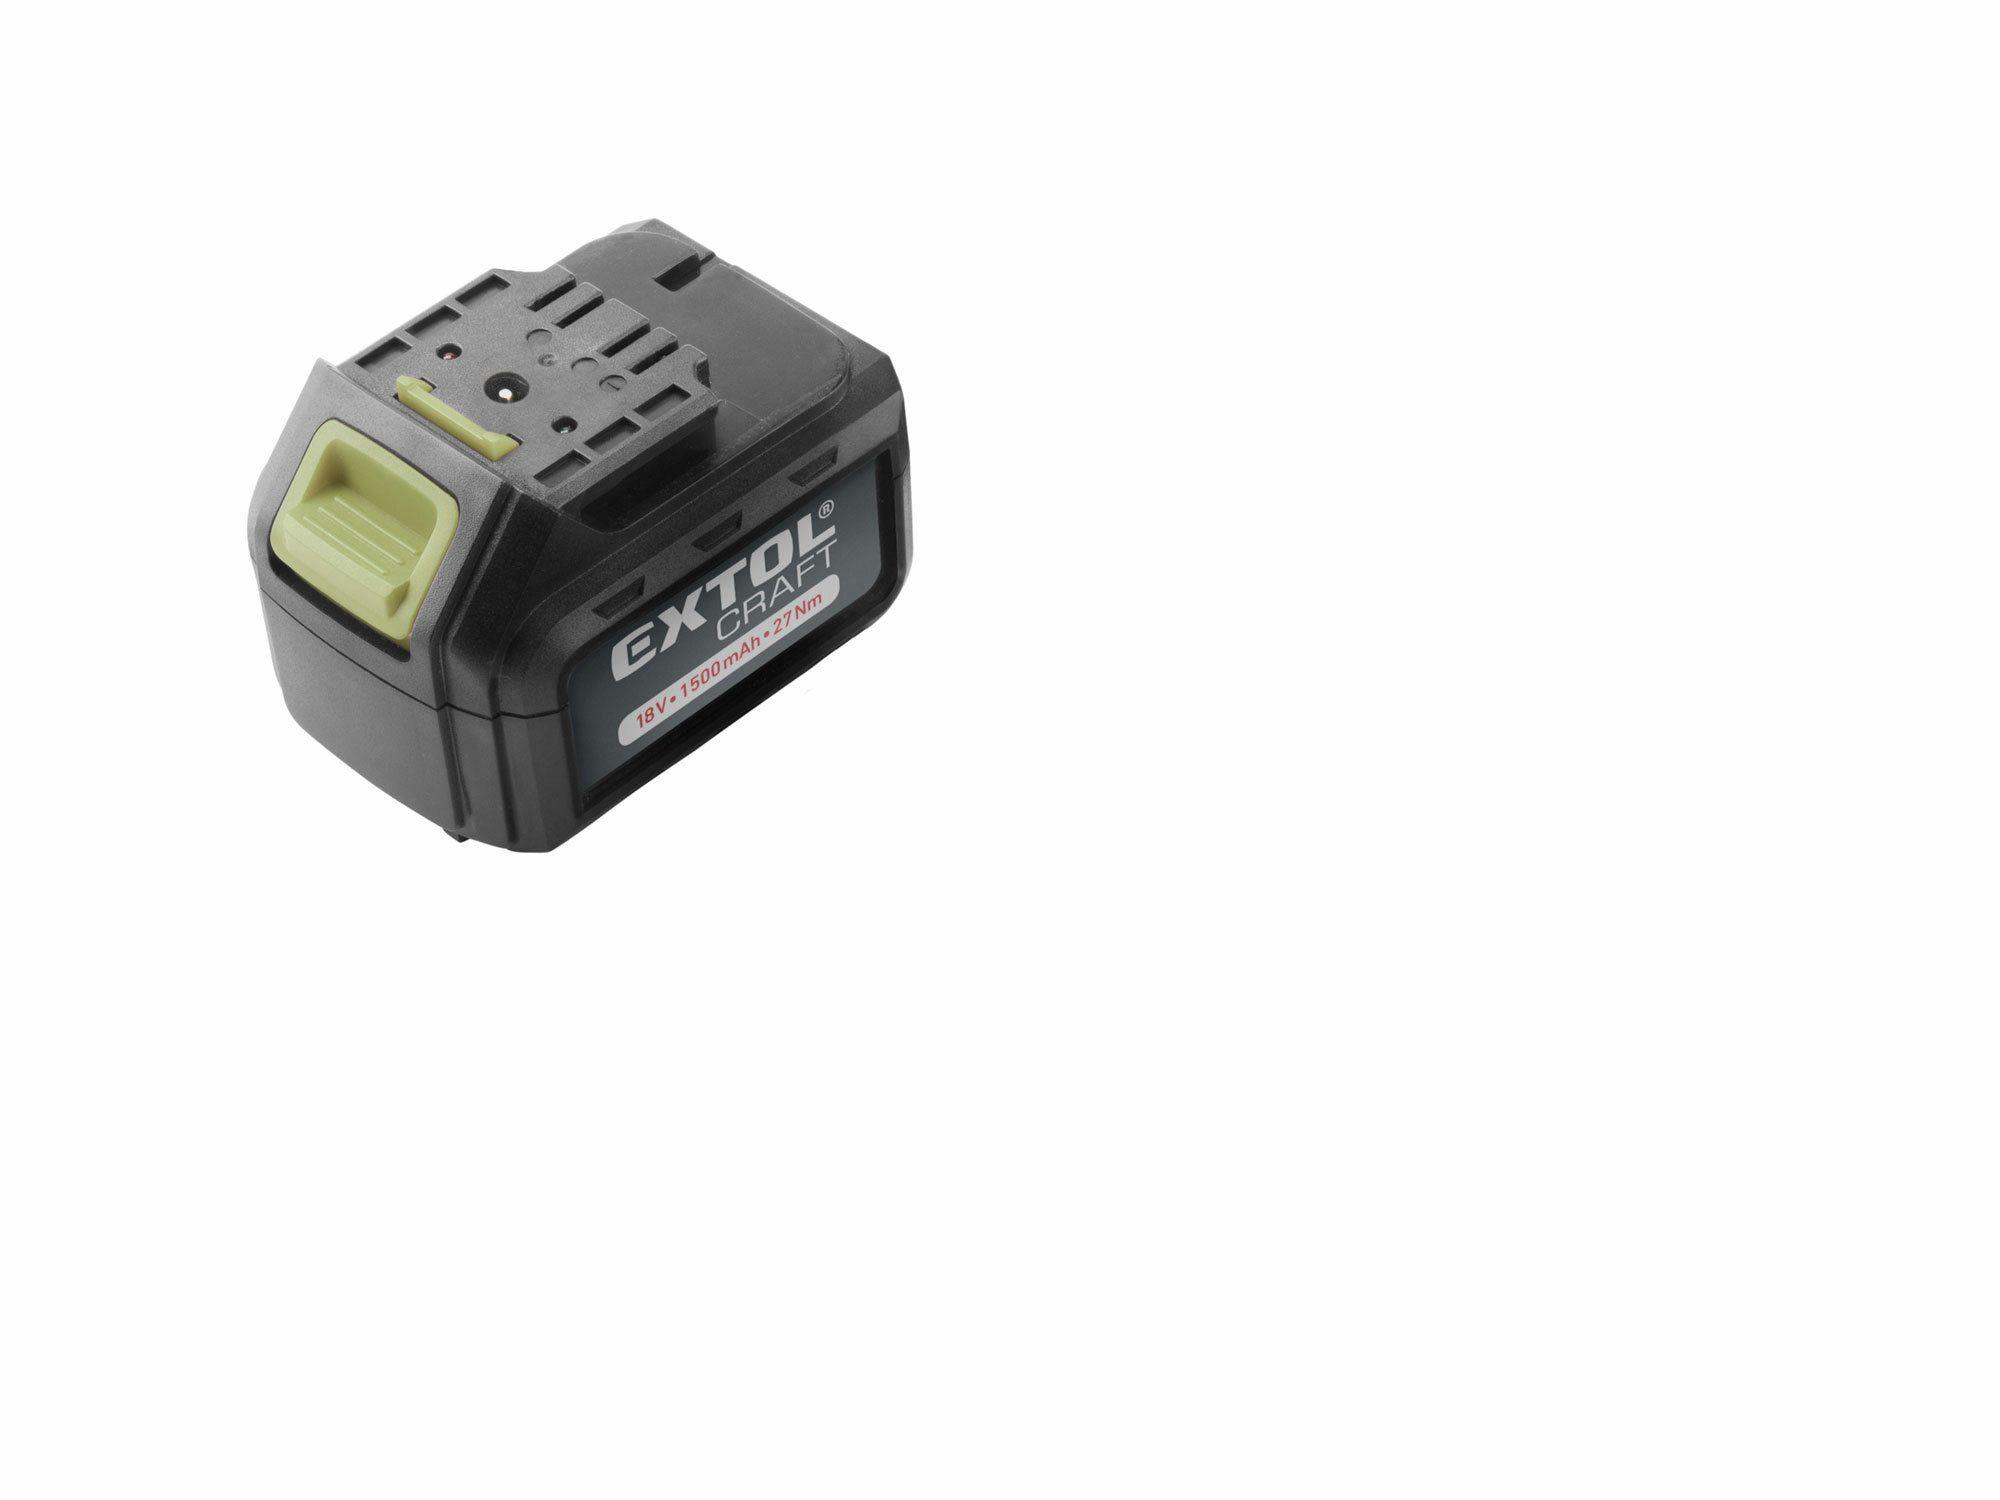 Baterie akumulátorová 18V, Li-ion, 1500mAh, EXTOL CRAFT